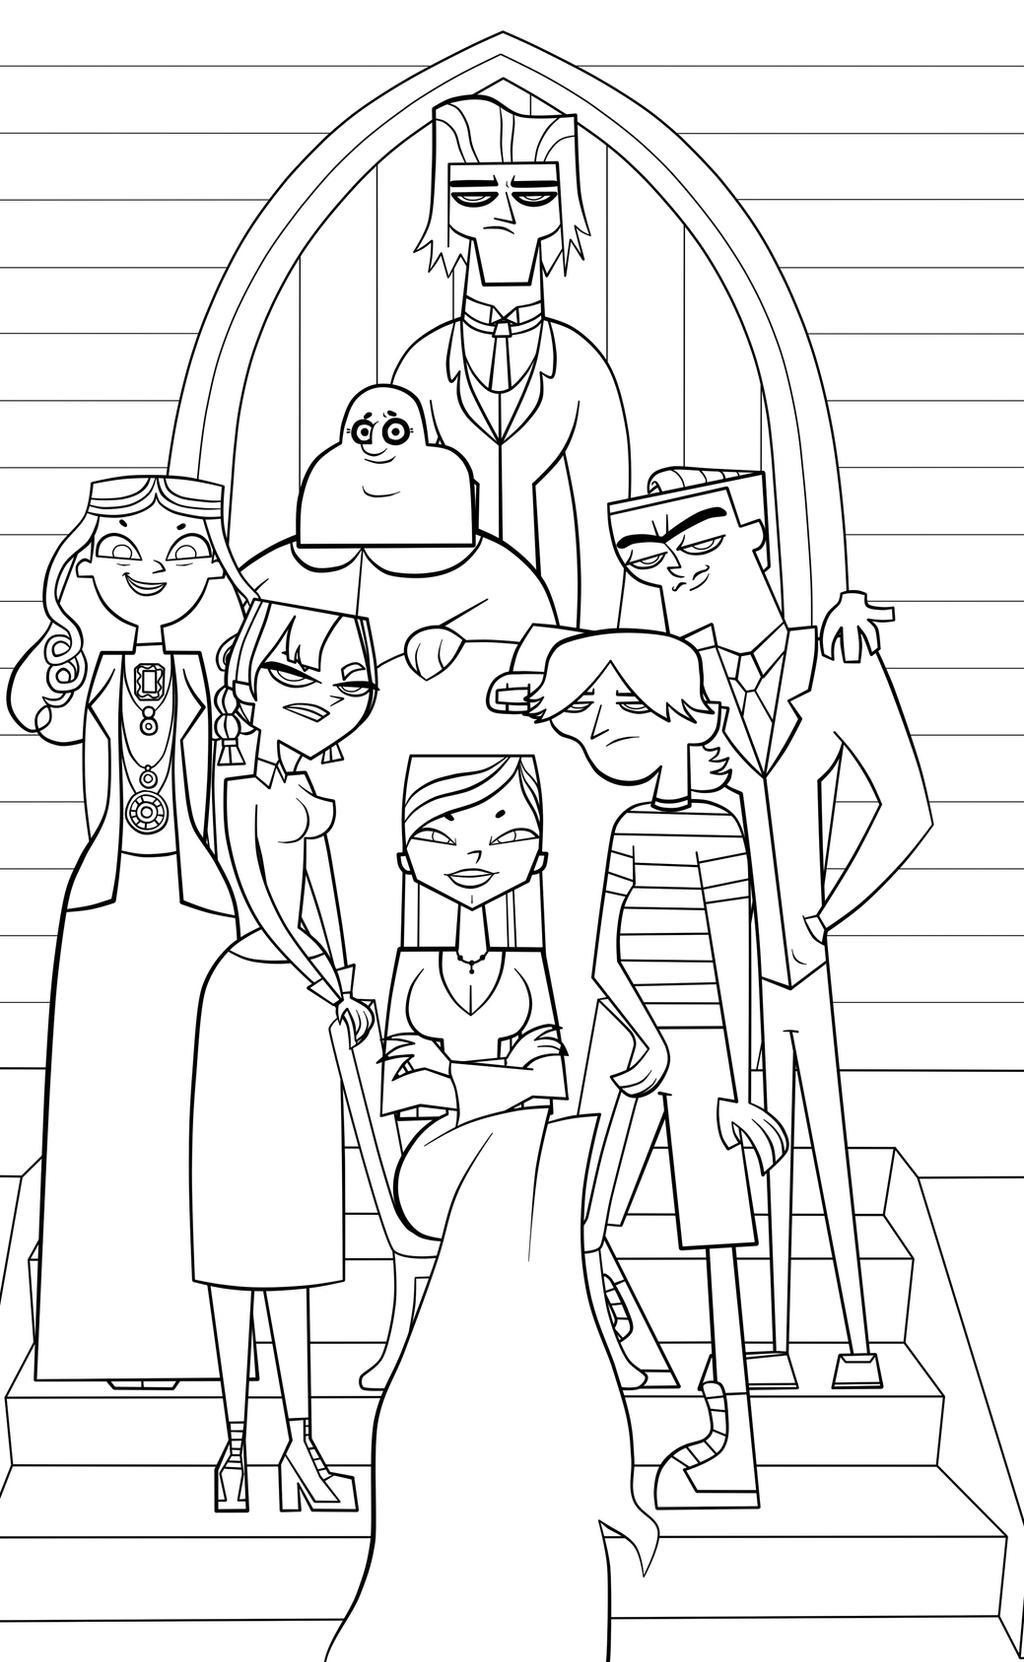 Disney Wedding Coloring Pages Printable Disney Best Free